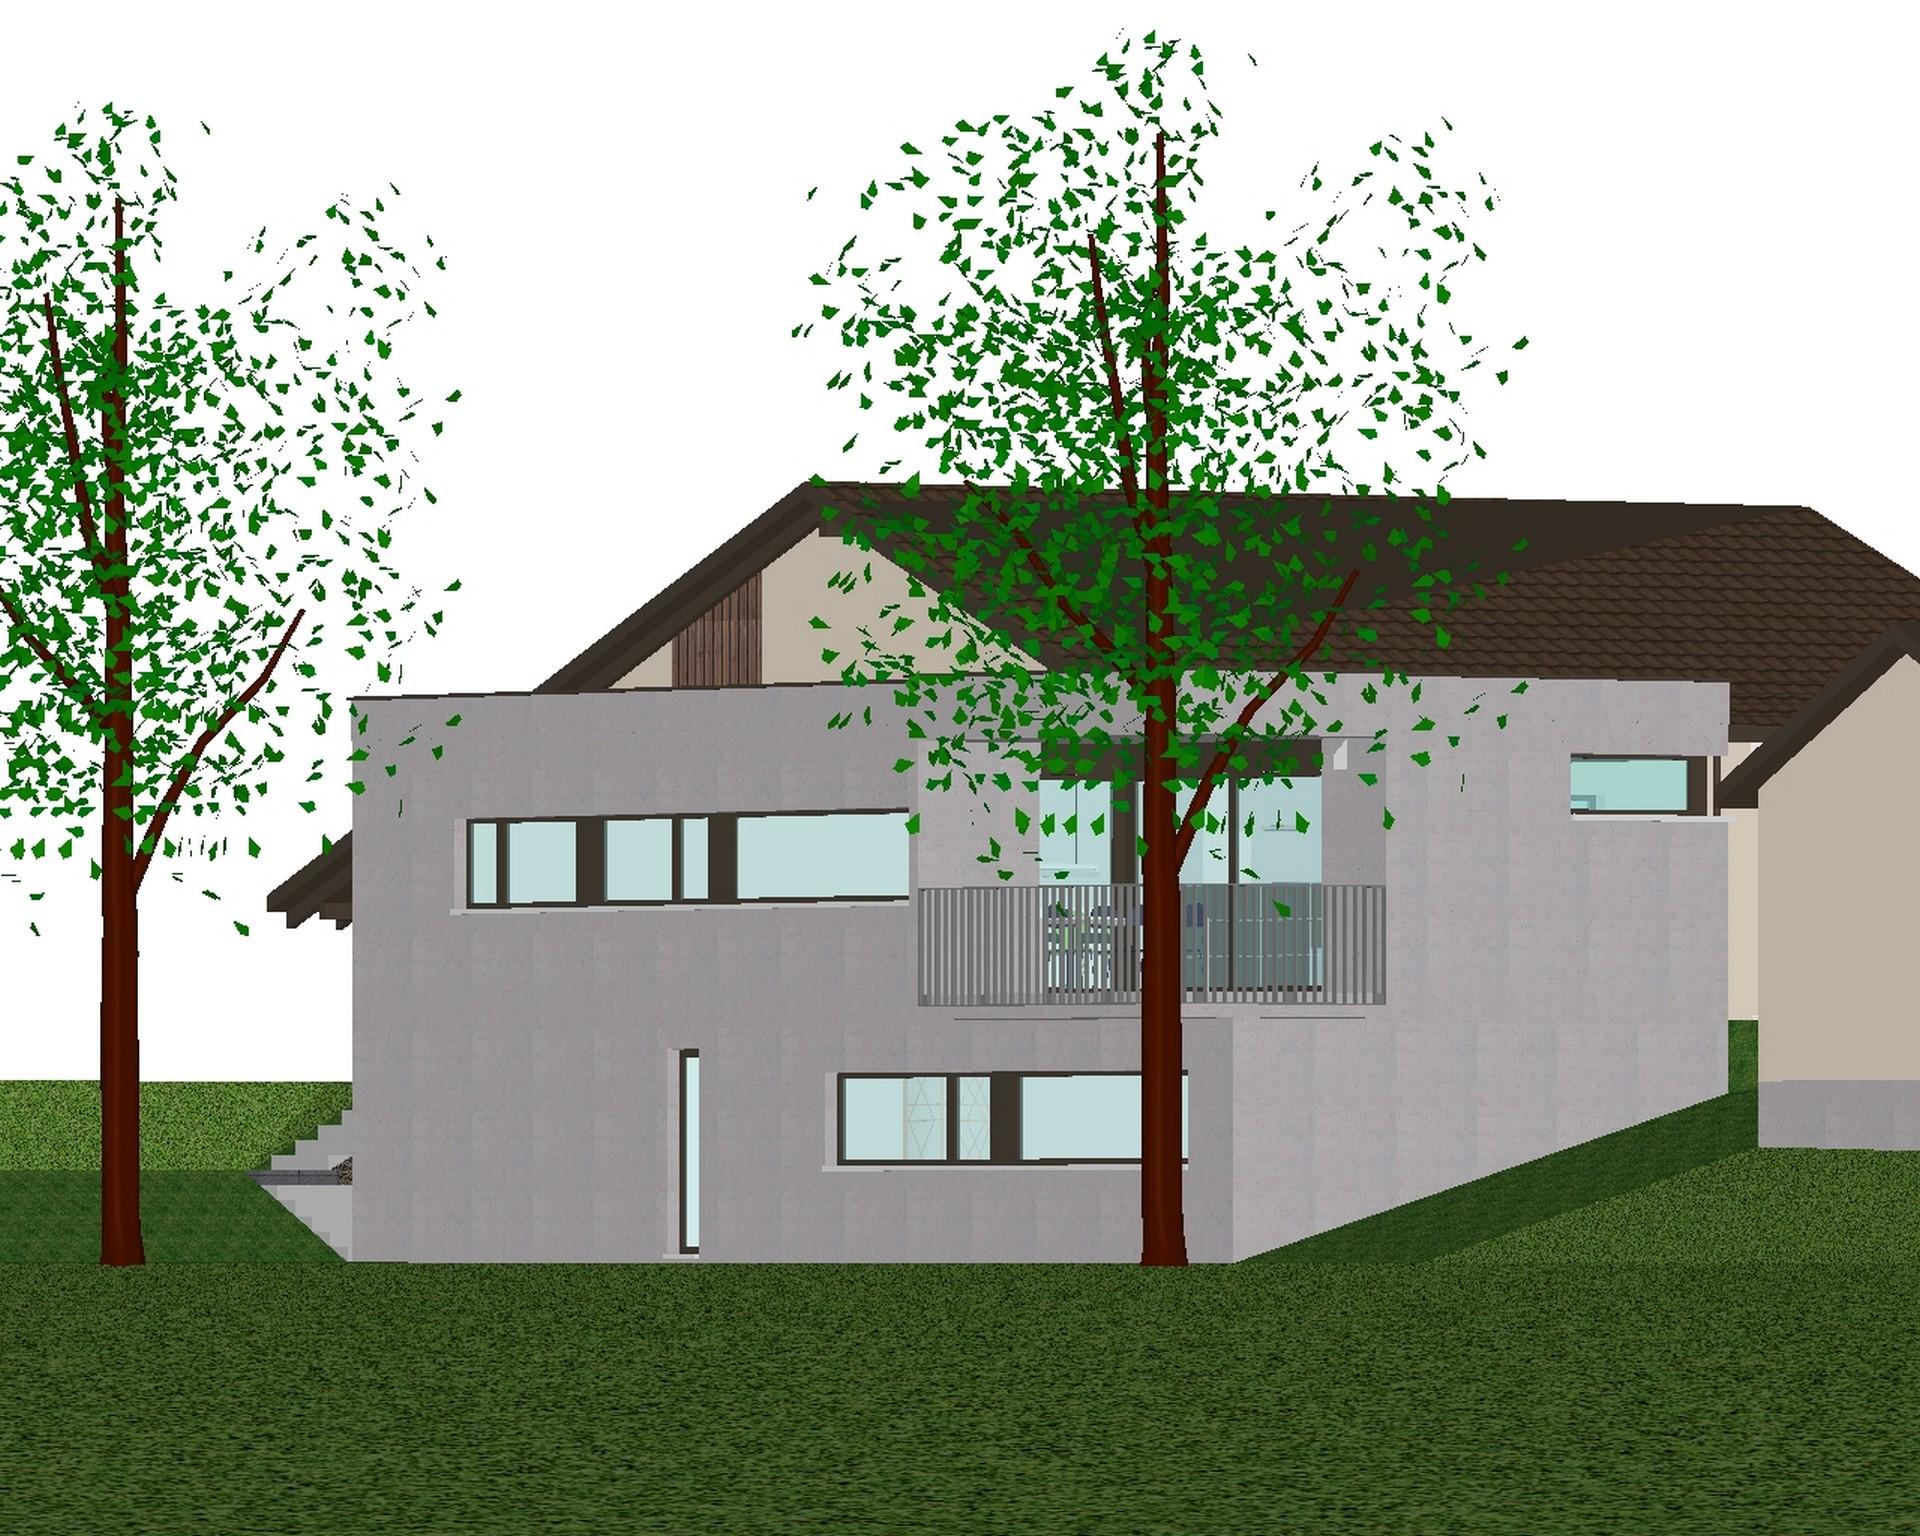 2009 Büren an der Aare – Anbau-Projekt Einfamilienhaus